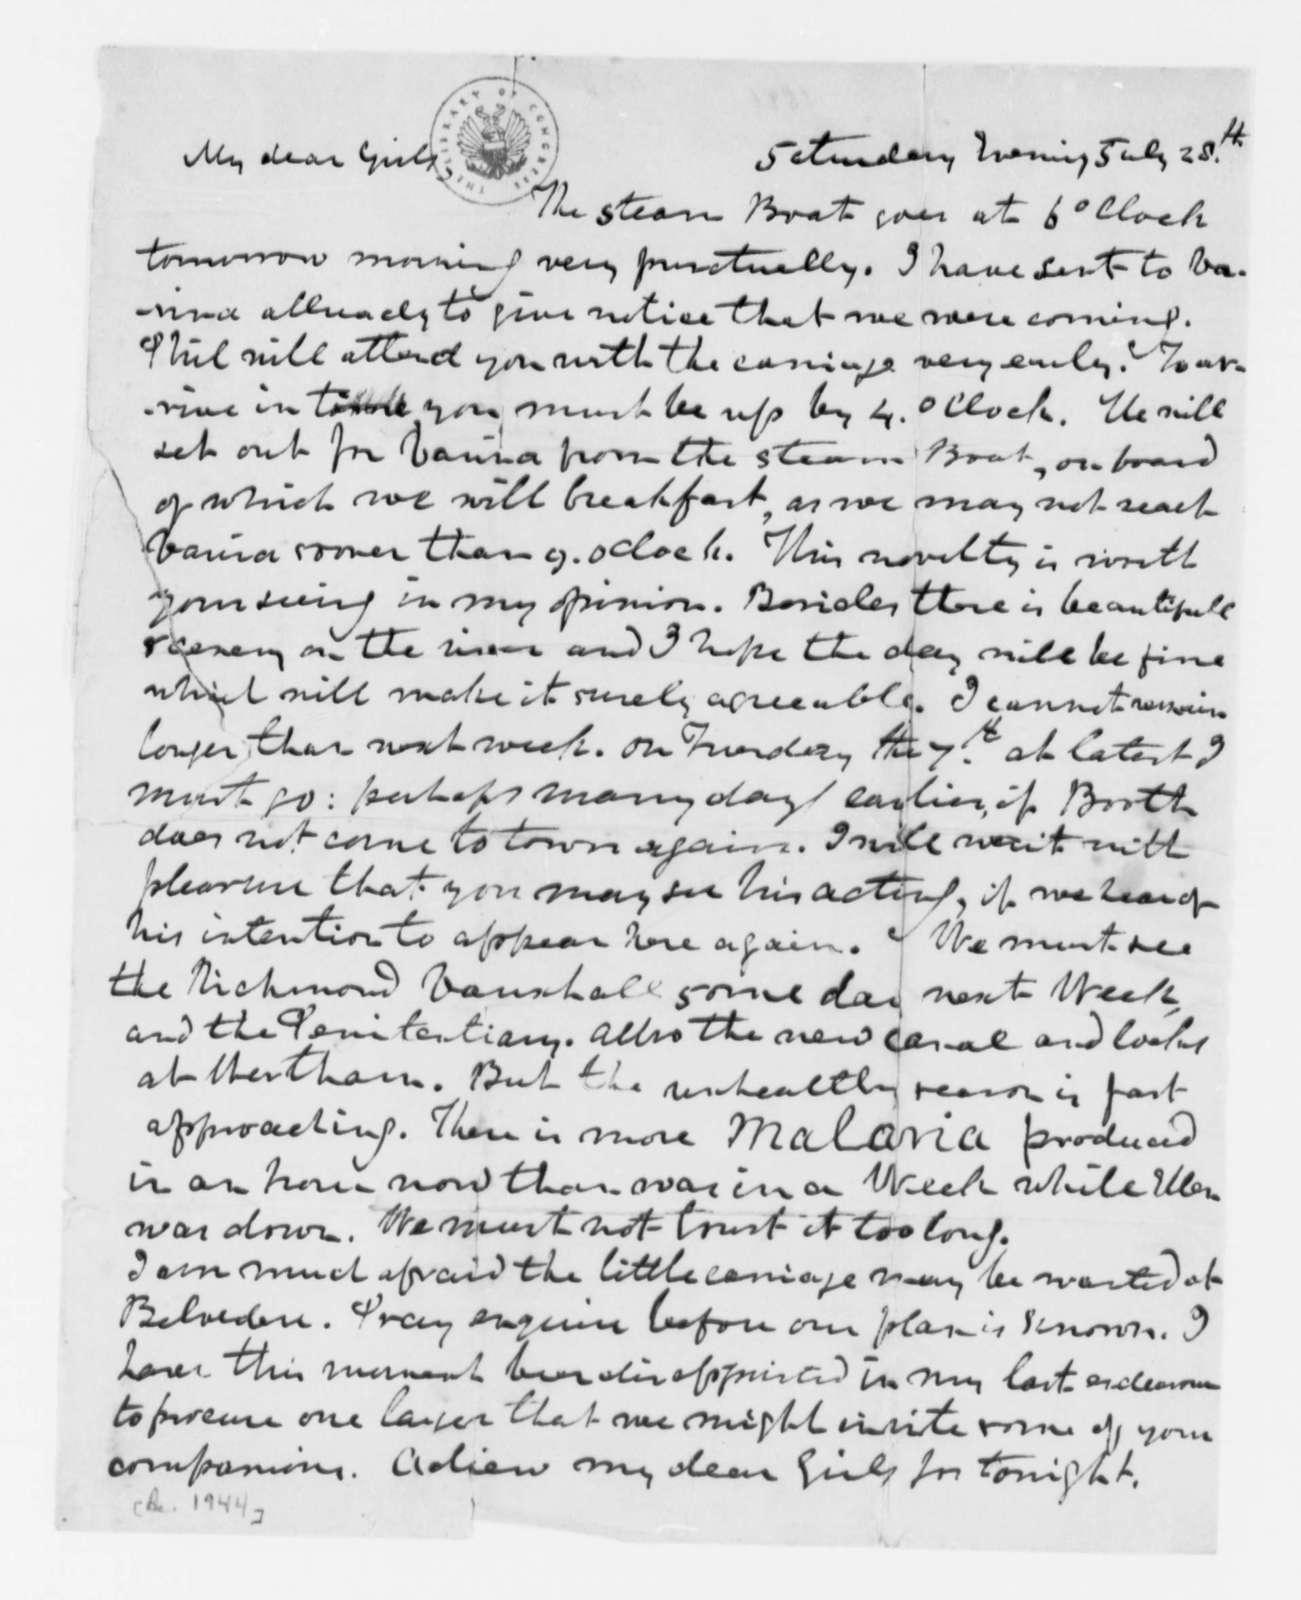 Thomas Mann Randolph, Jr. to Cornelia Randolph, July 28, 1820